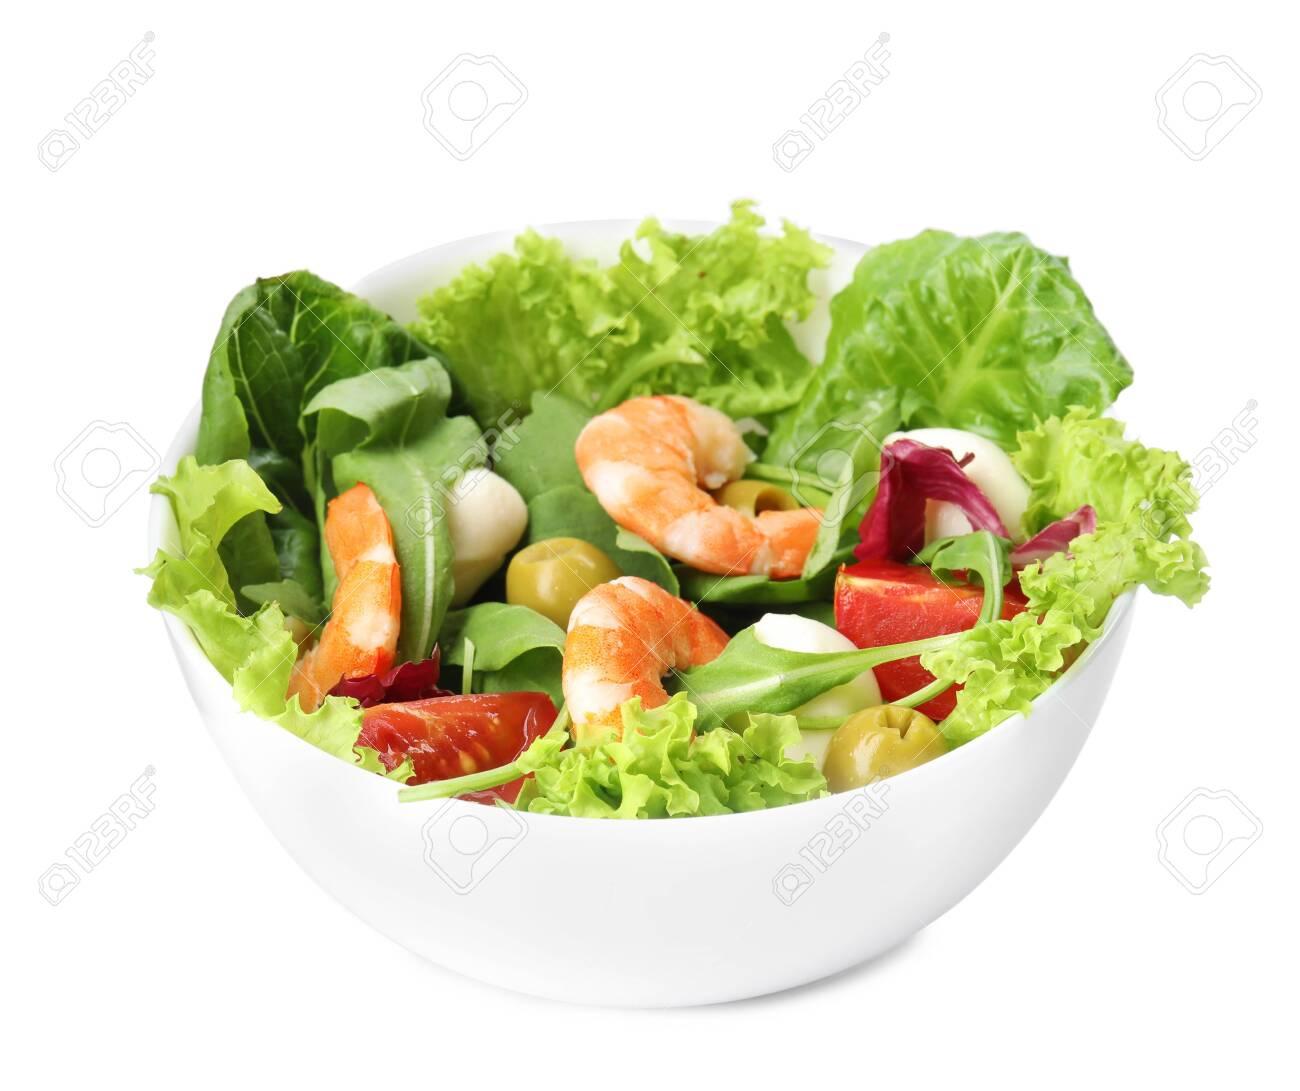 Tasty salad of fresh ingredients on white background - 130583005